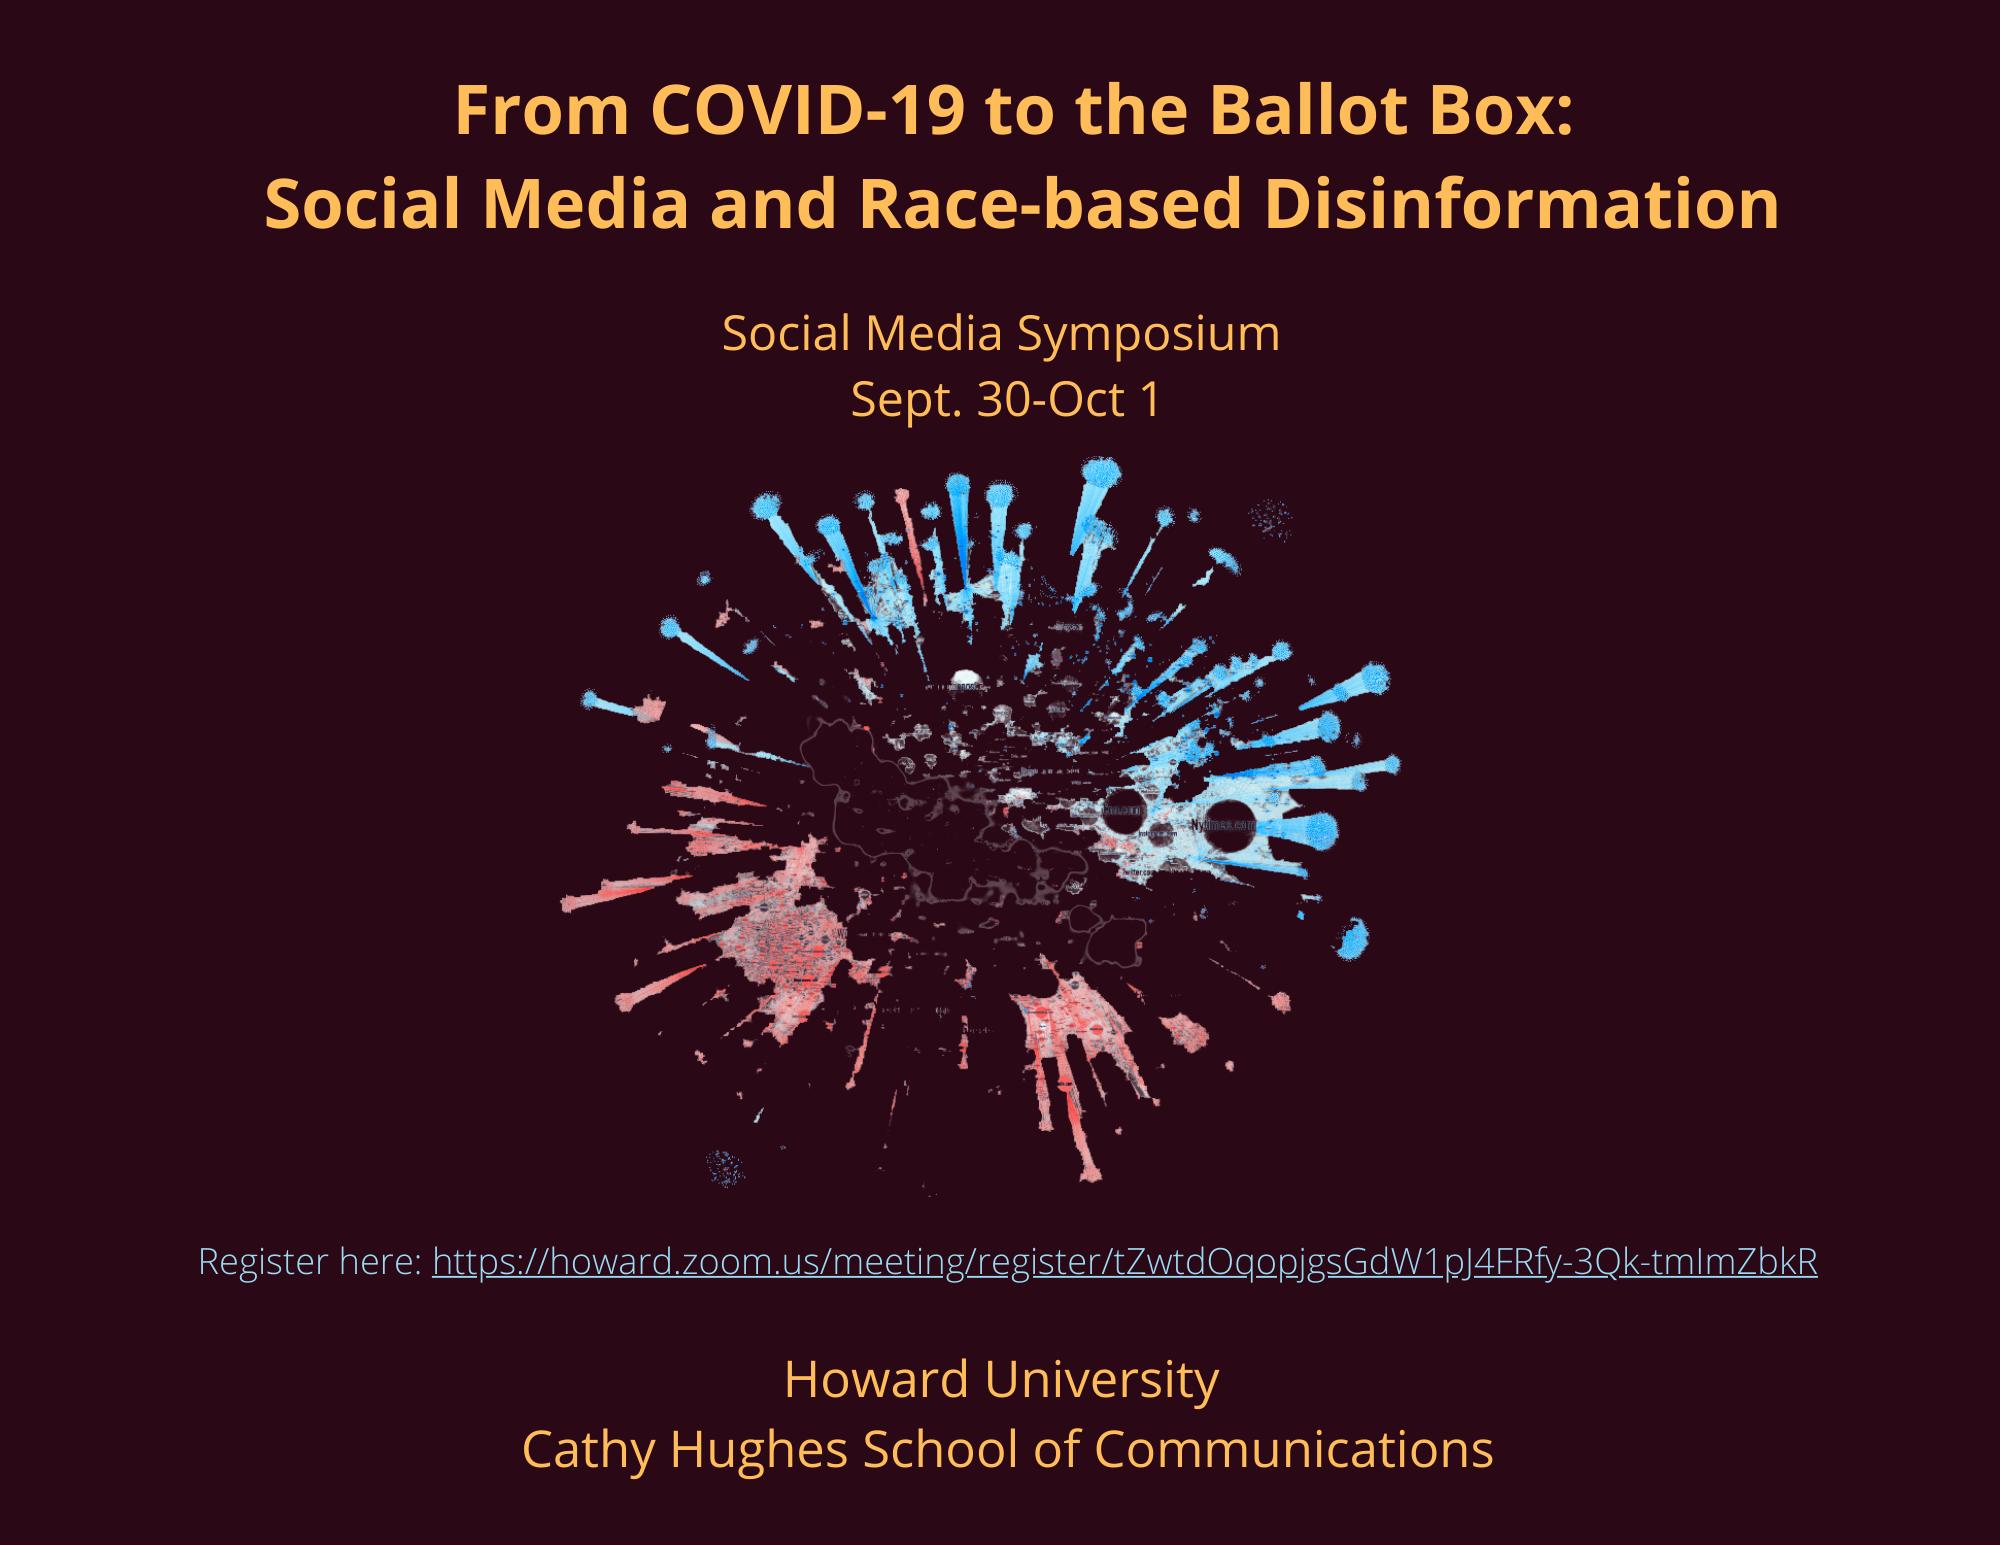 Social Media Symposium Fall 2021